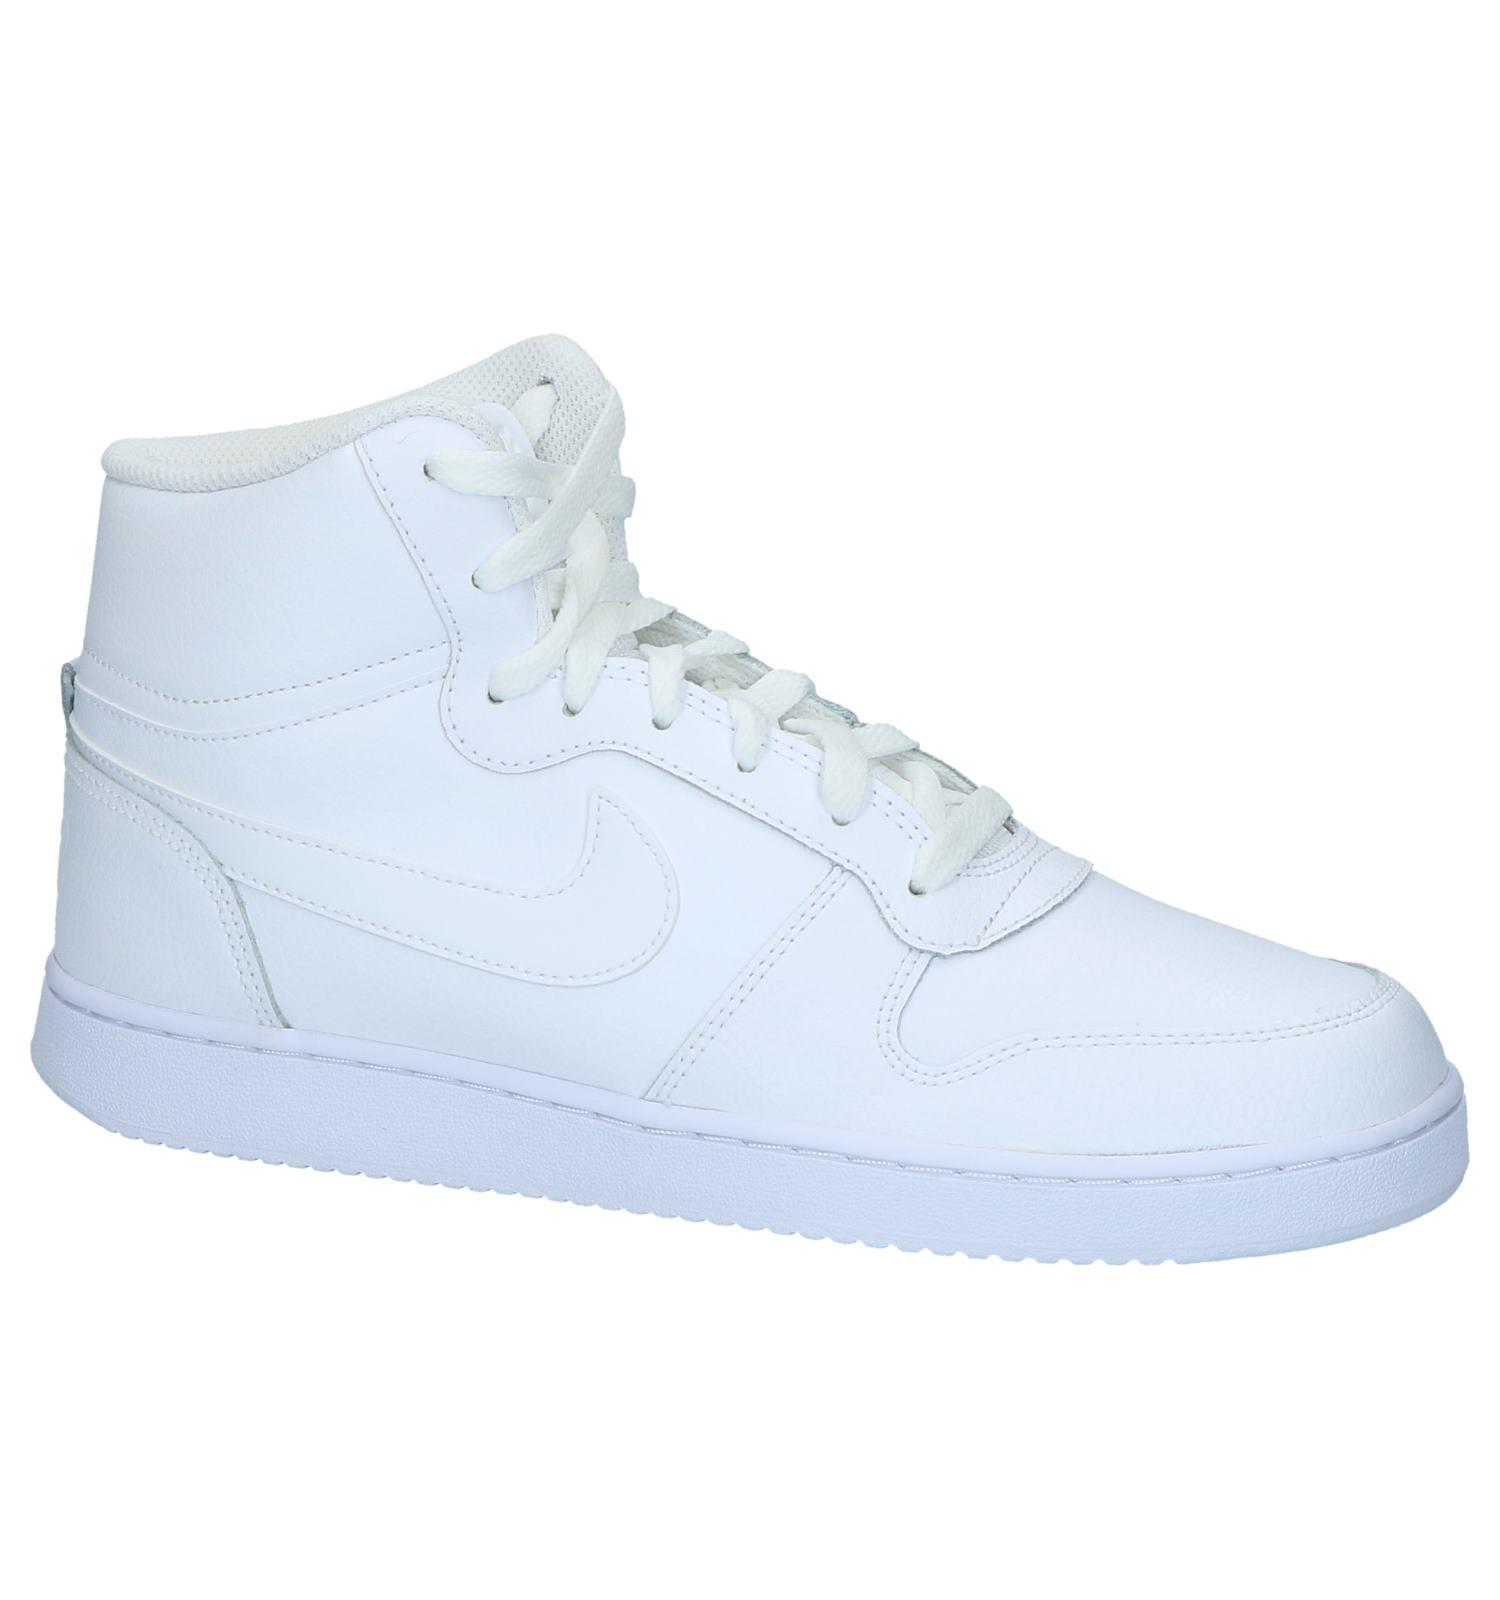 9042218ad65 Nike Ebernon Witte Hoge Sneakers | TORFS.BE | Gratis verzend en retour